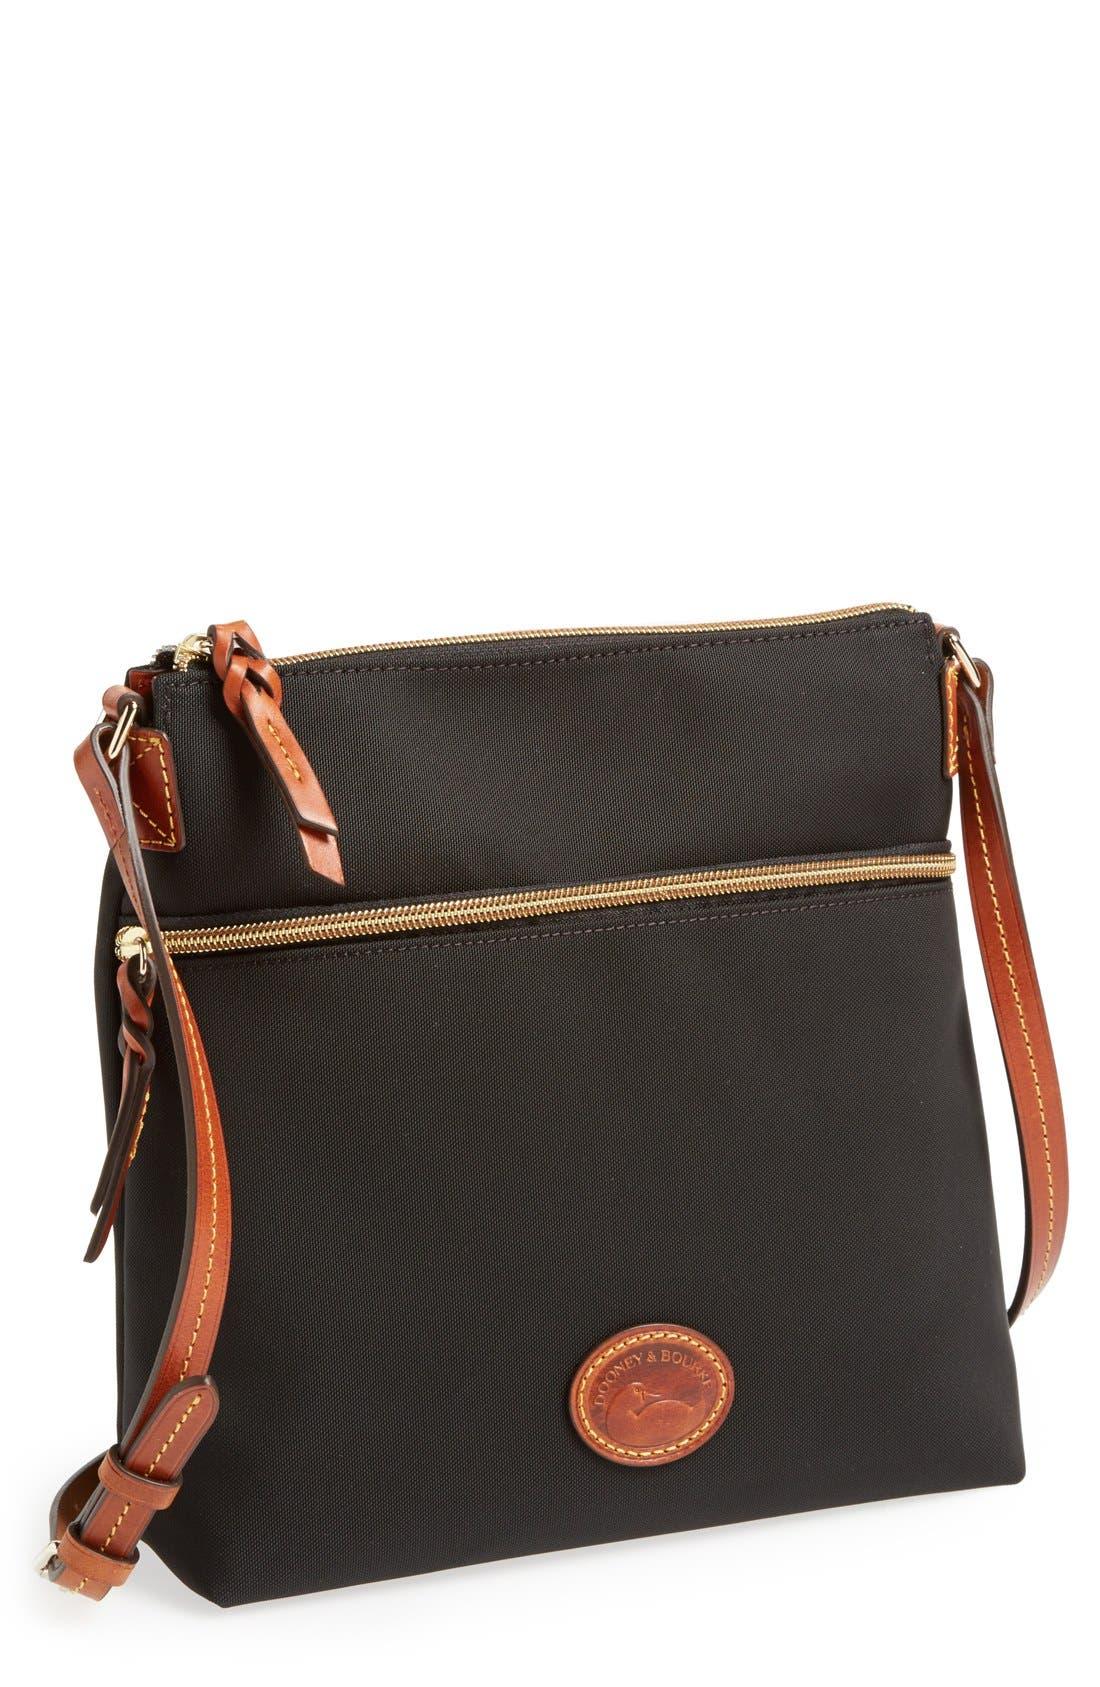 Alternate Image 1 Selected - Dooney & Bourke Crossbody Bag